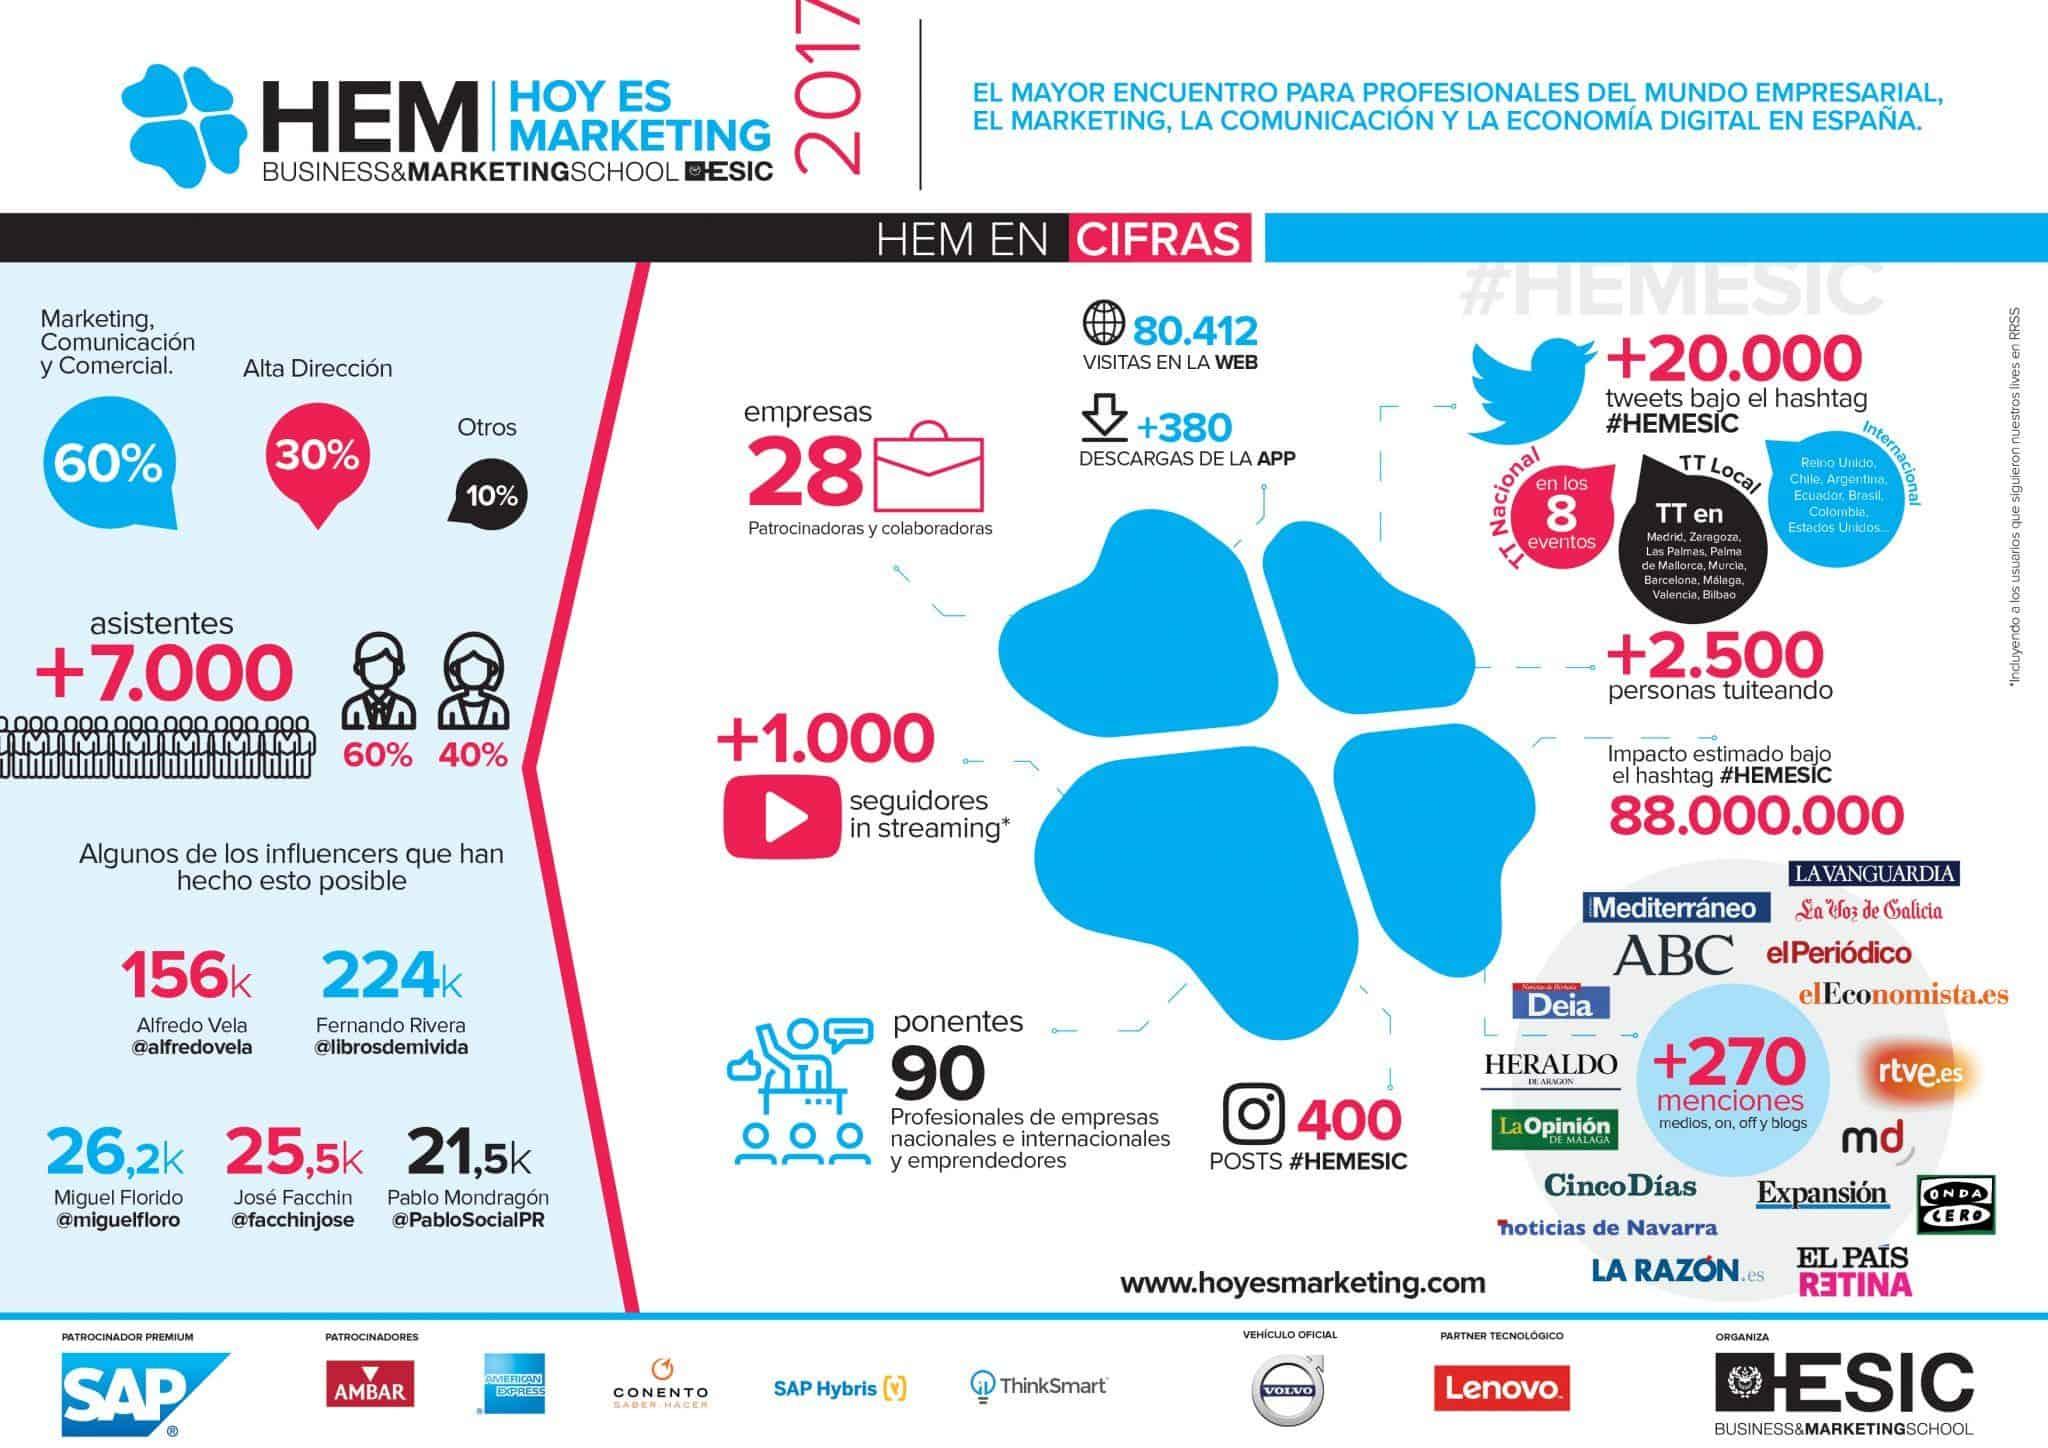 infografia_hem2017_general #Hemesic